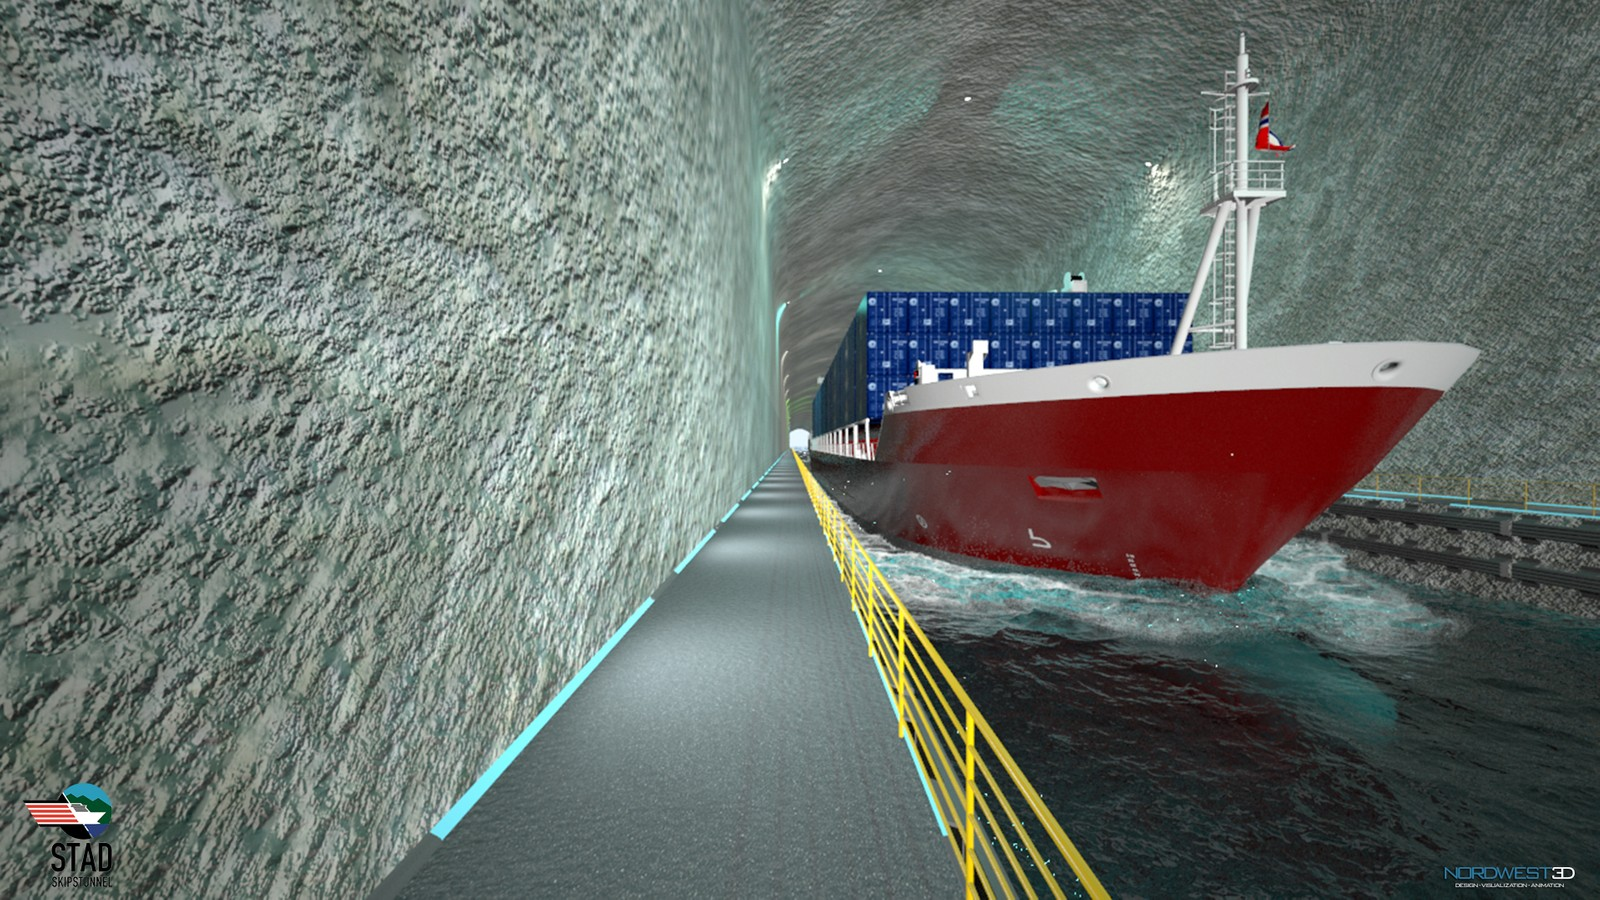 Containerskip i Stad skipstunnell (illustrasjon).